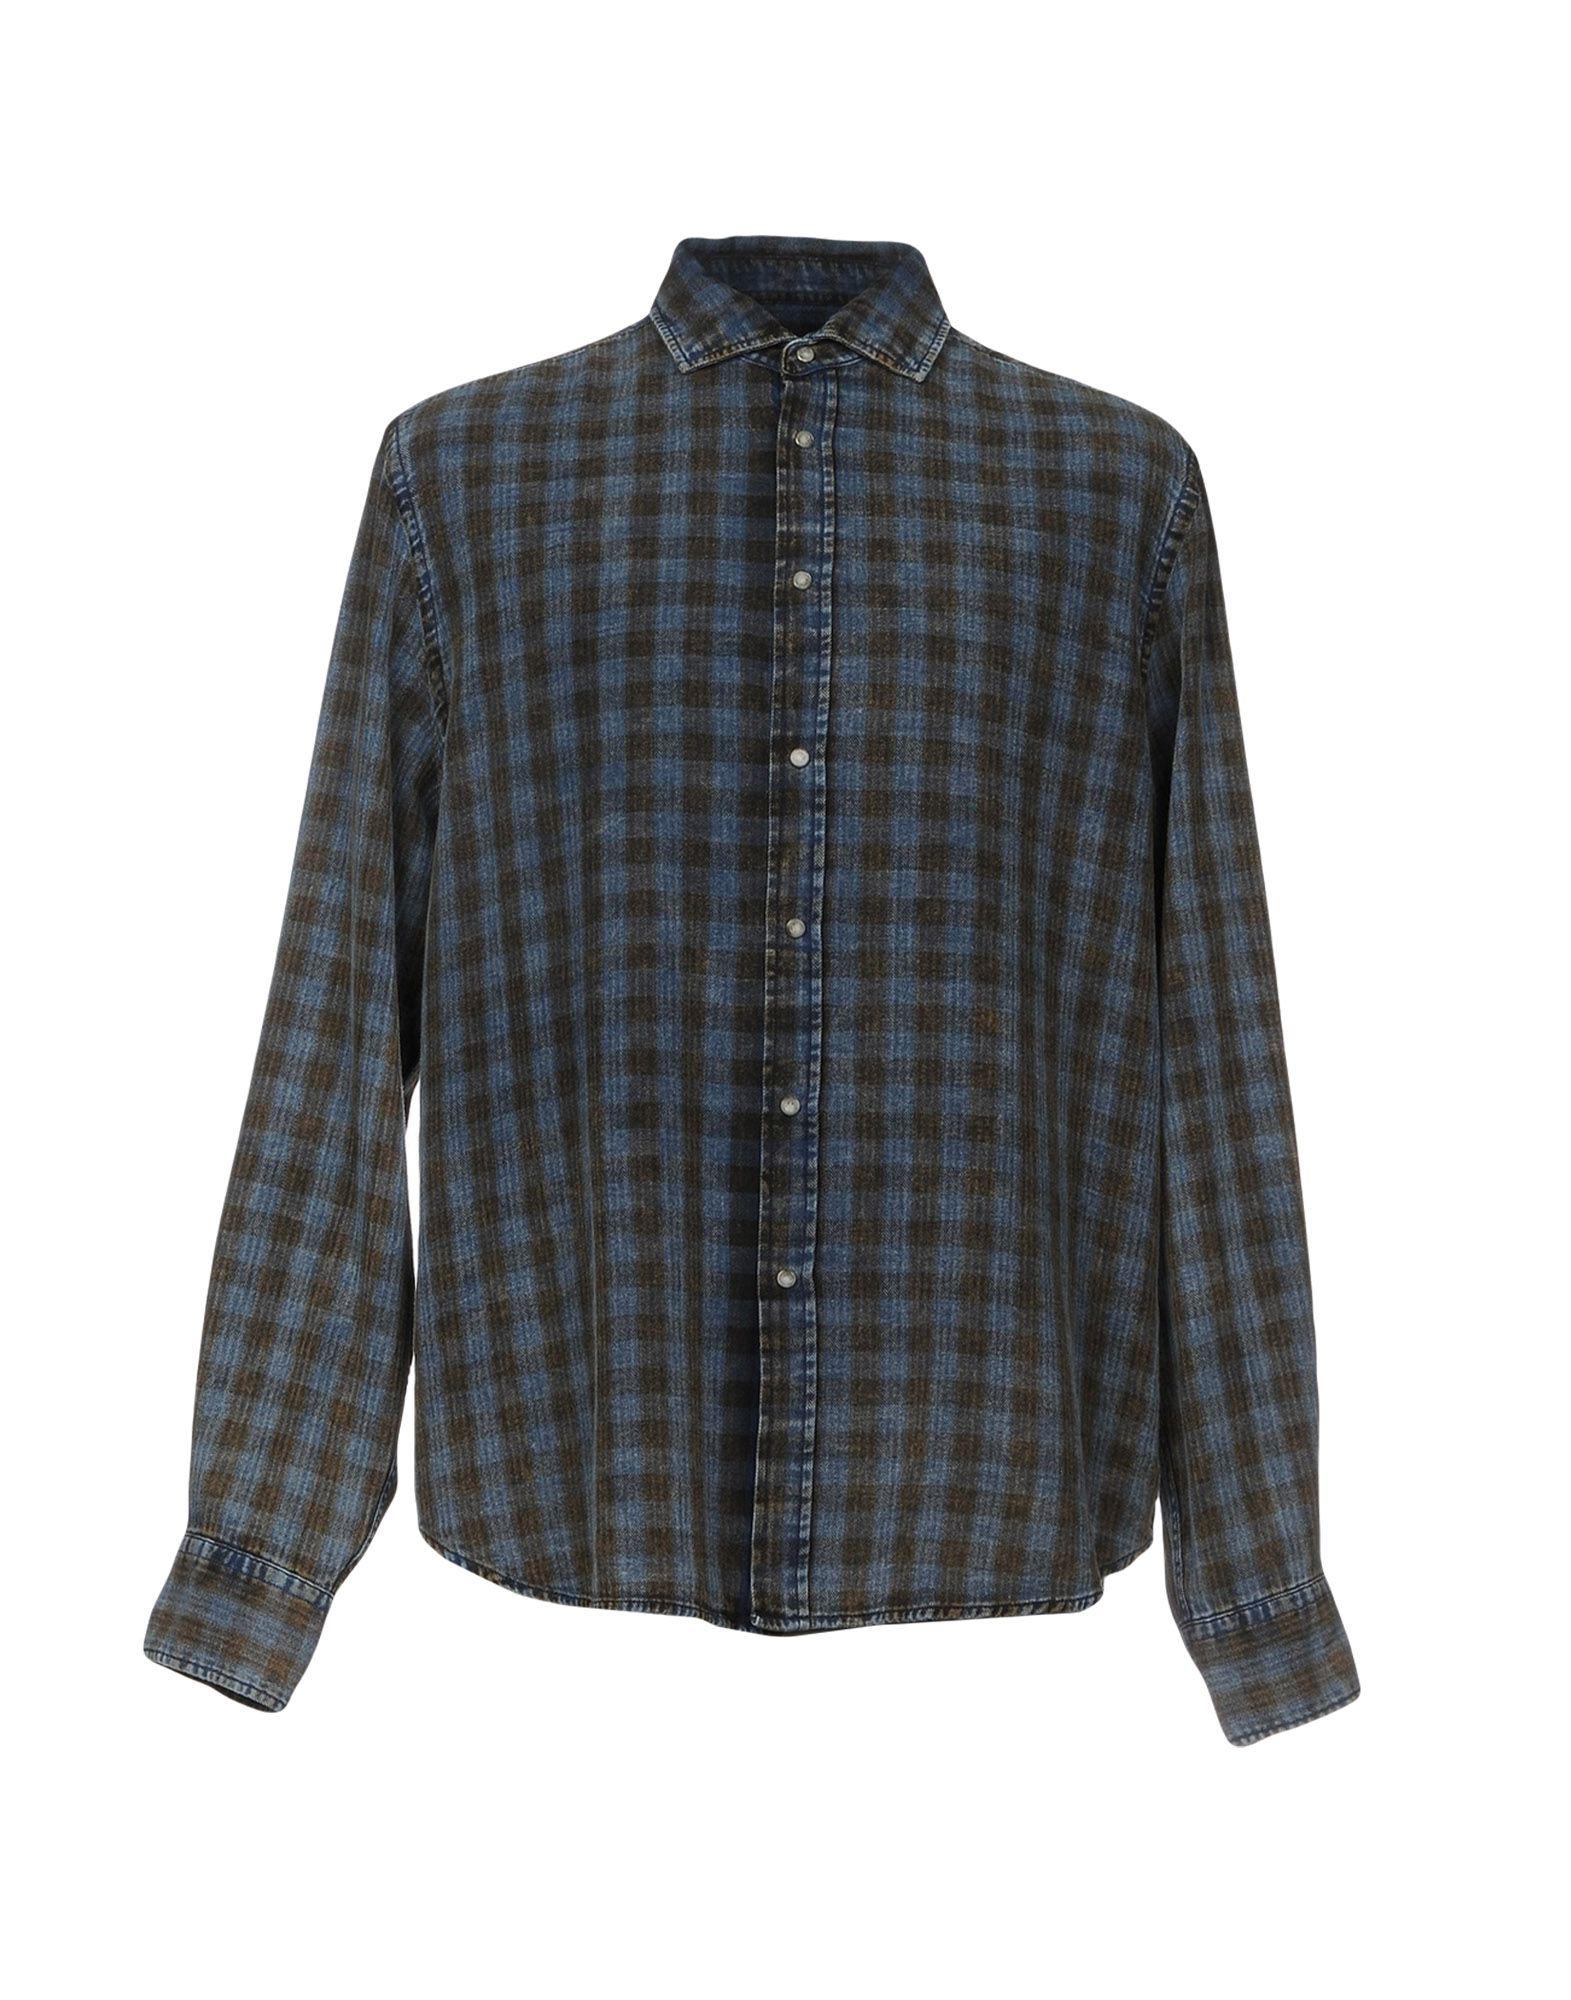 TRUSSARDI JEANS Джинсовая рубашка